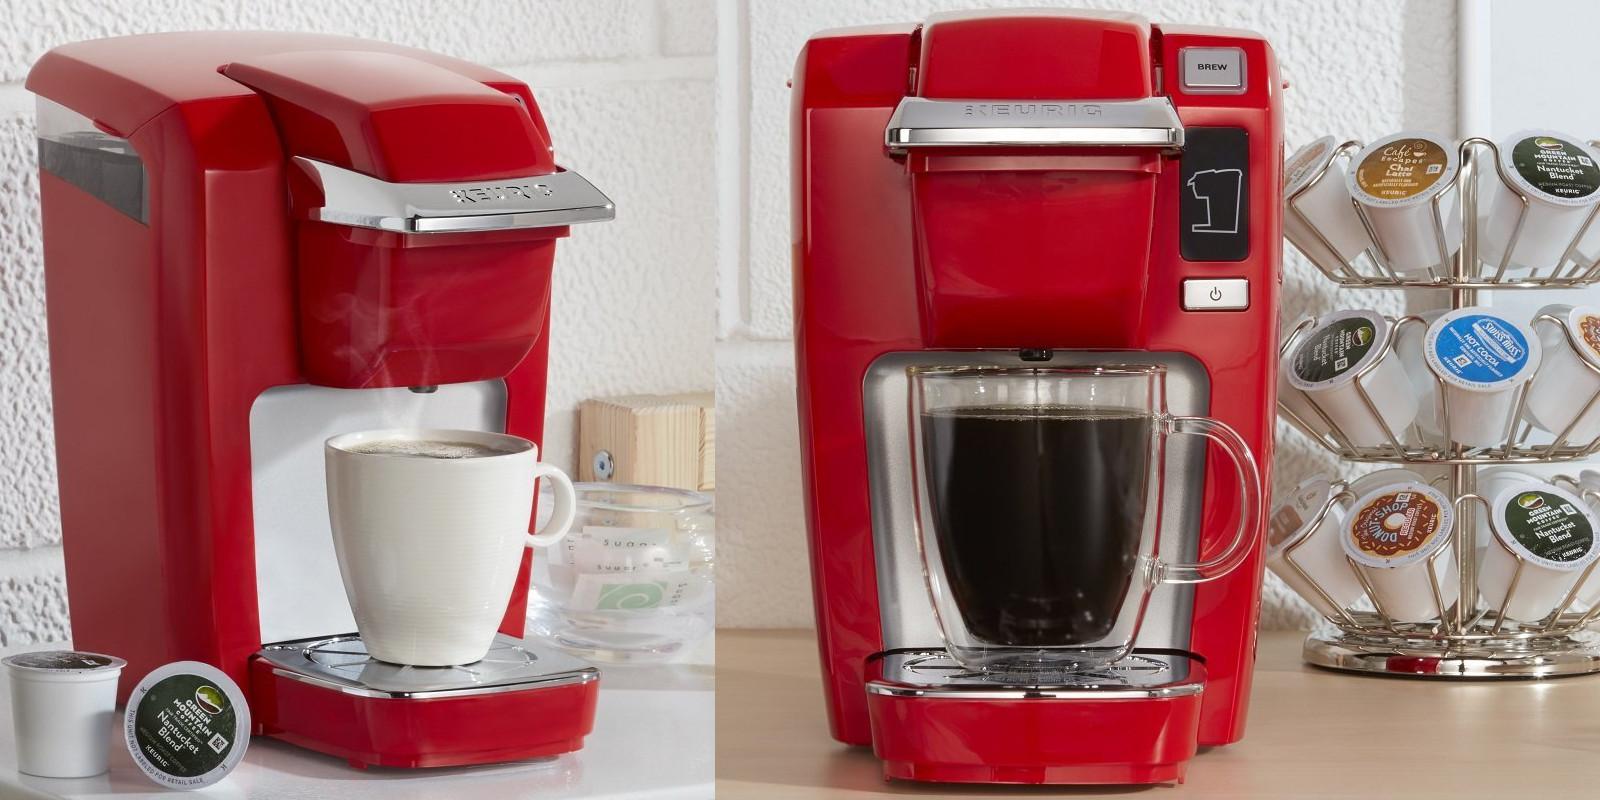 keurig-k15-single-serve-compact-k-cup-pod-coffee-maker-2